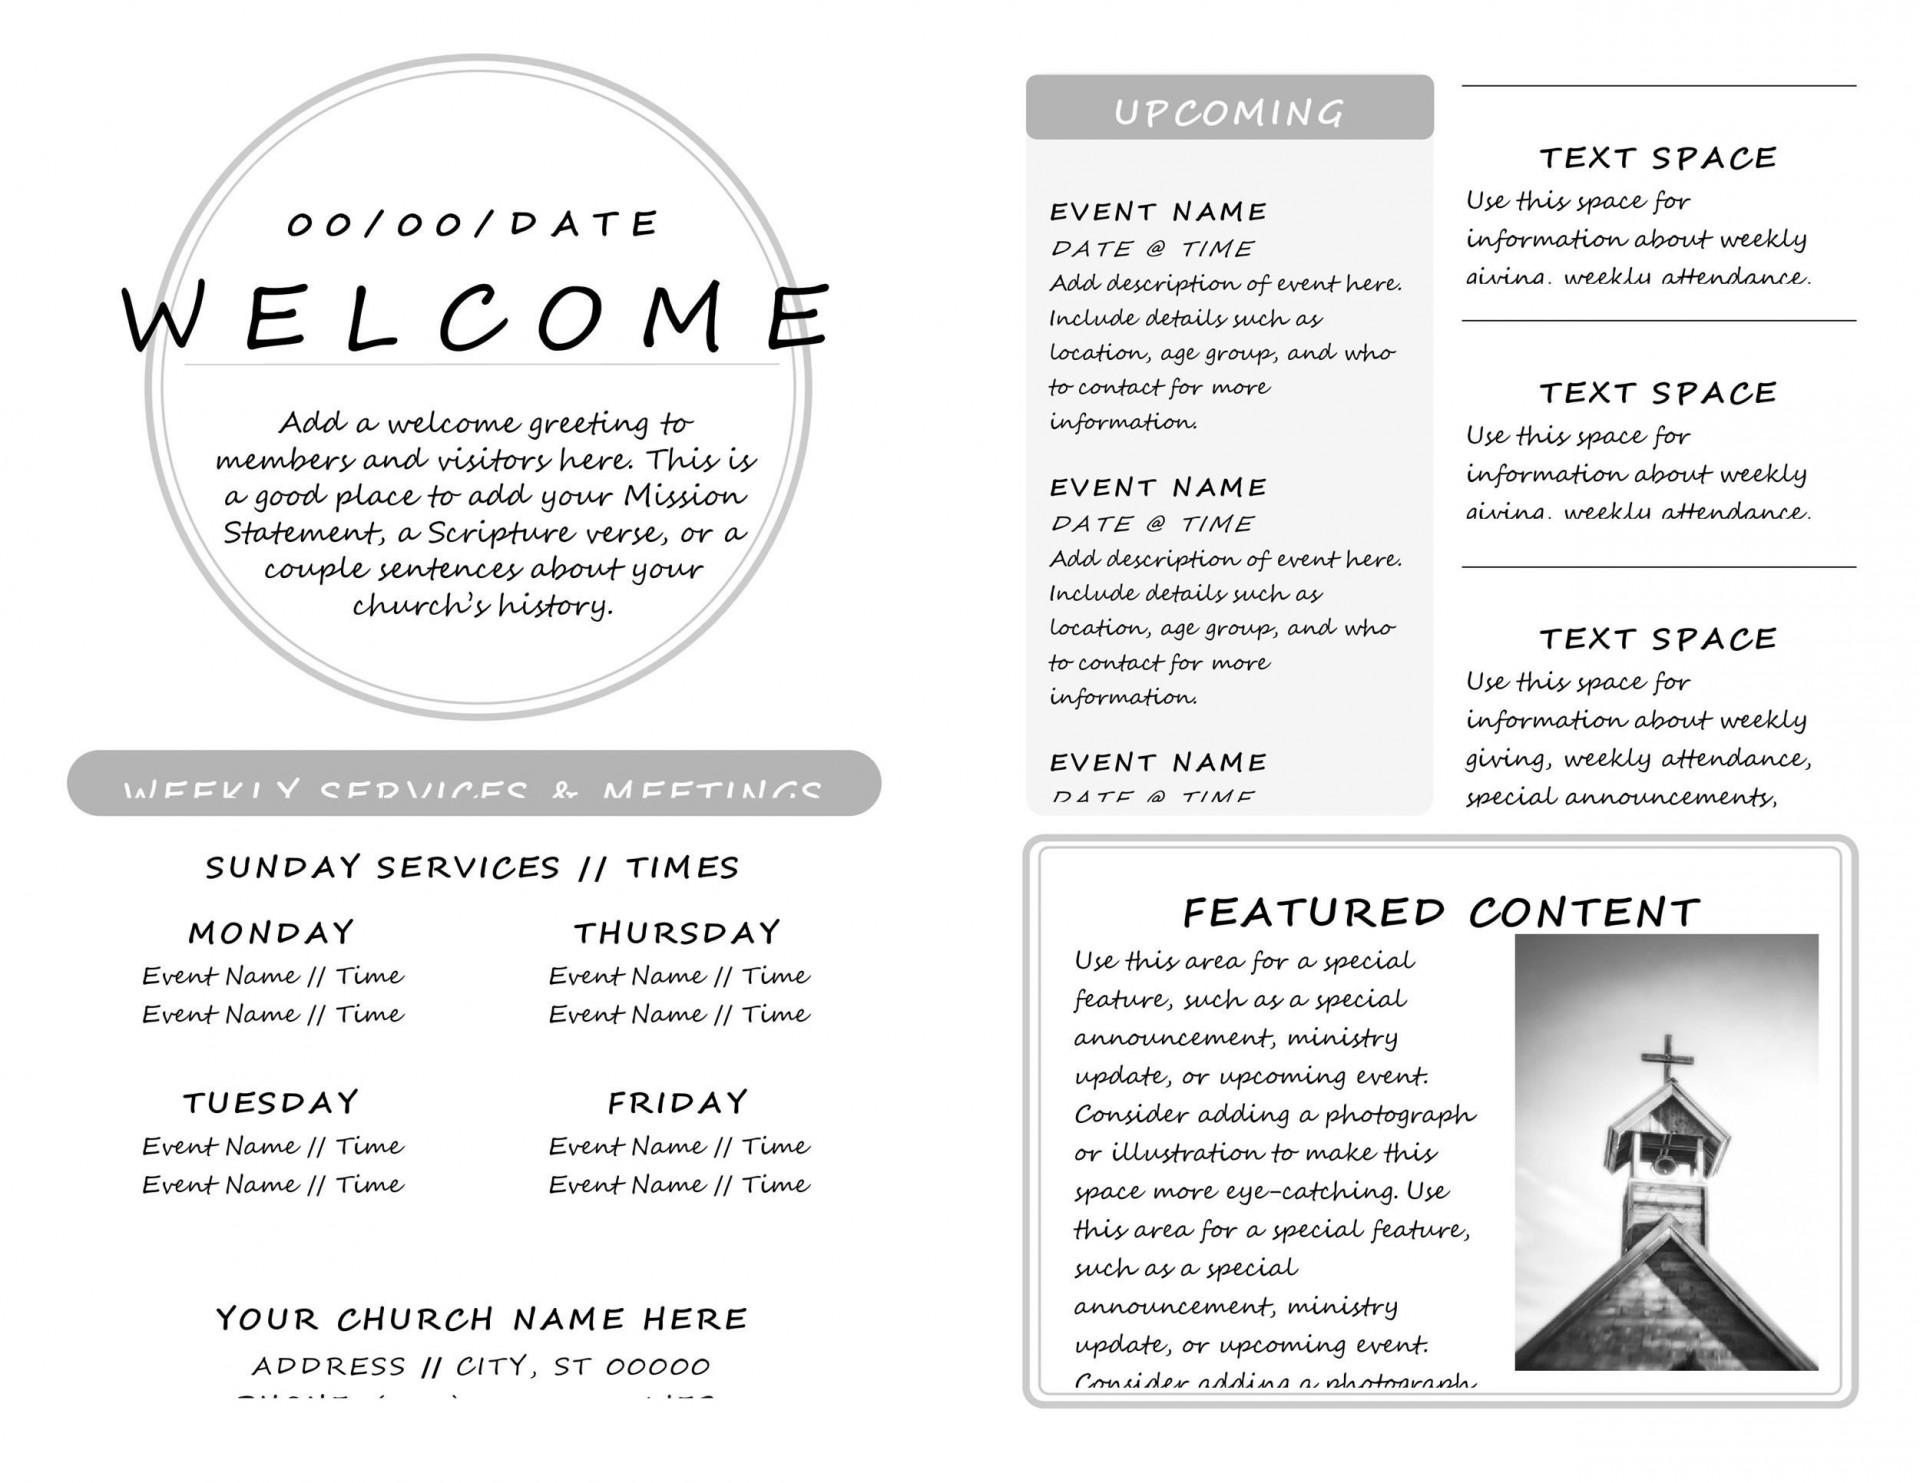 006 Impressive Free Church Program Template Download Image  Downloads Bulletin1920